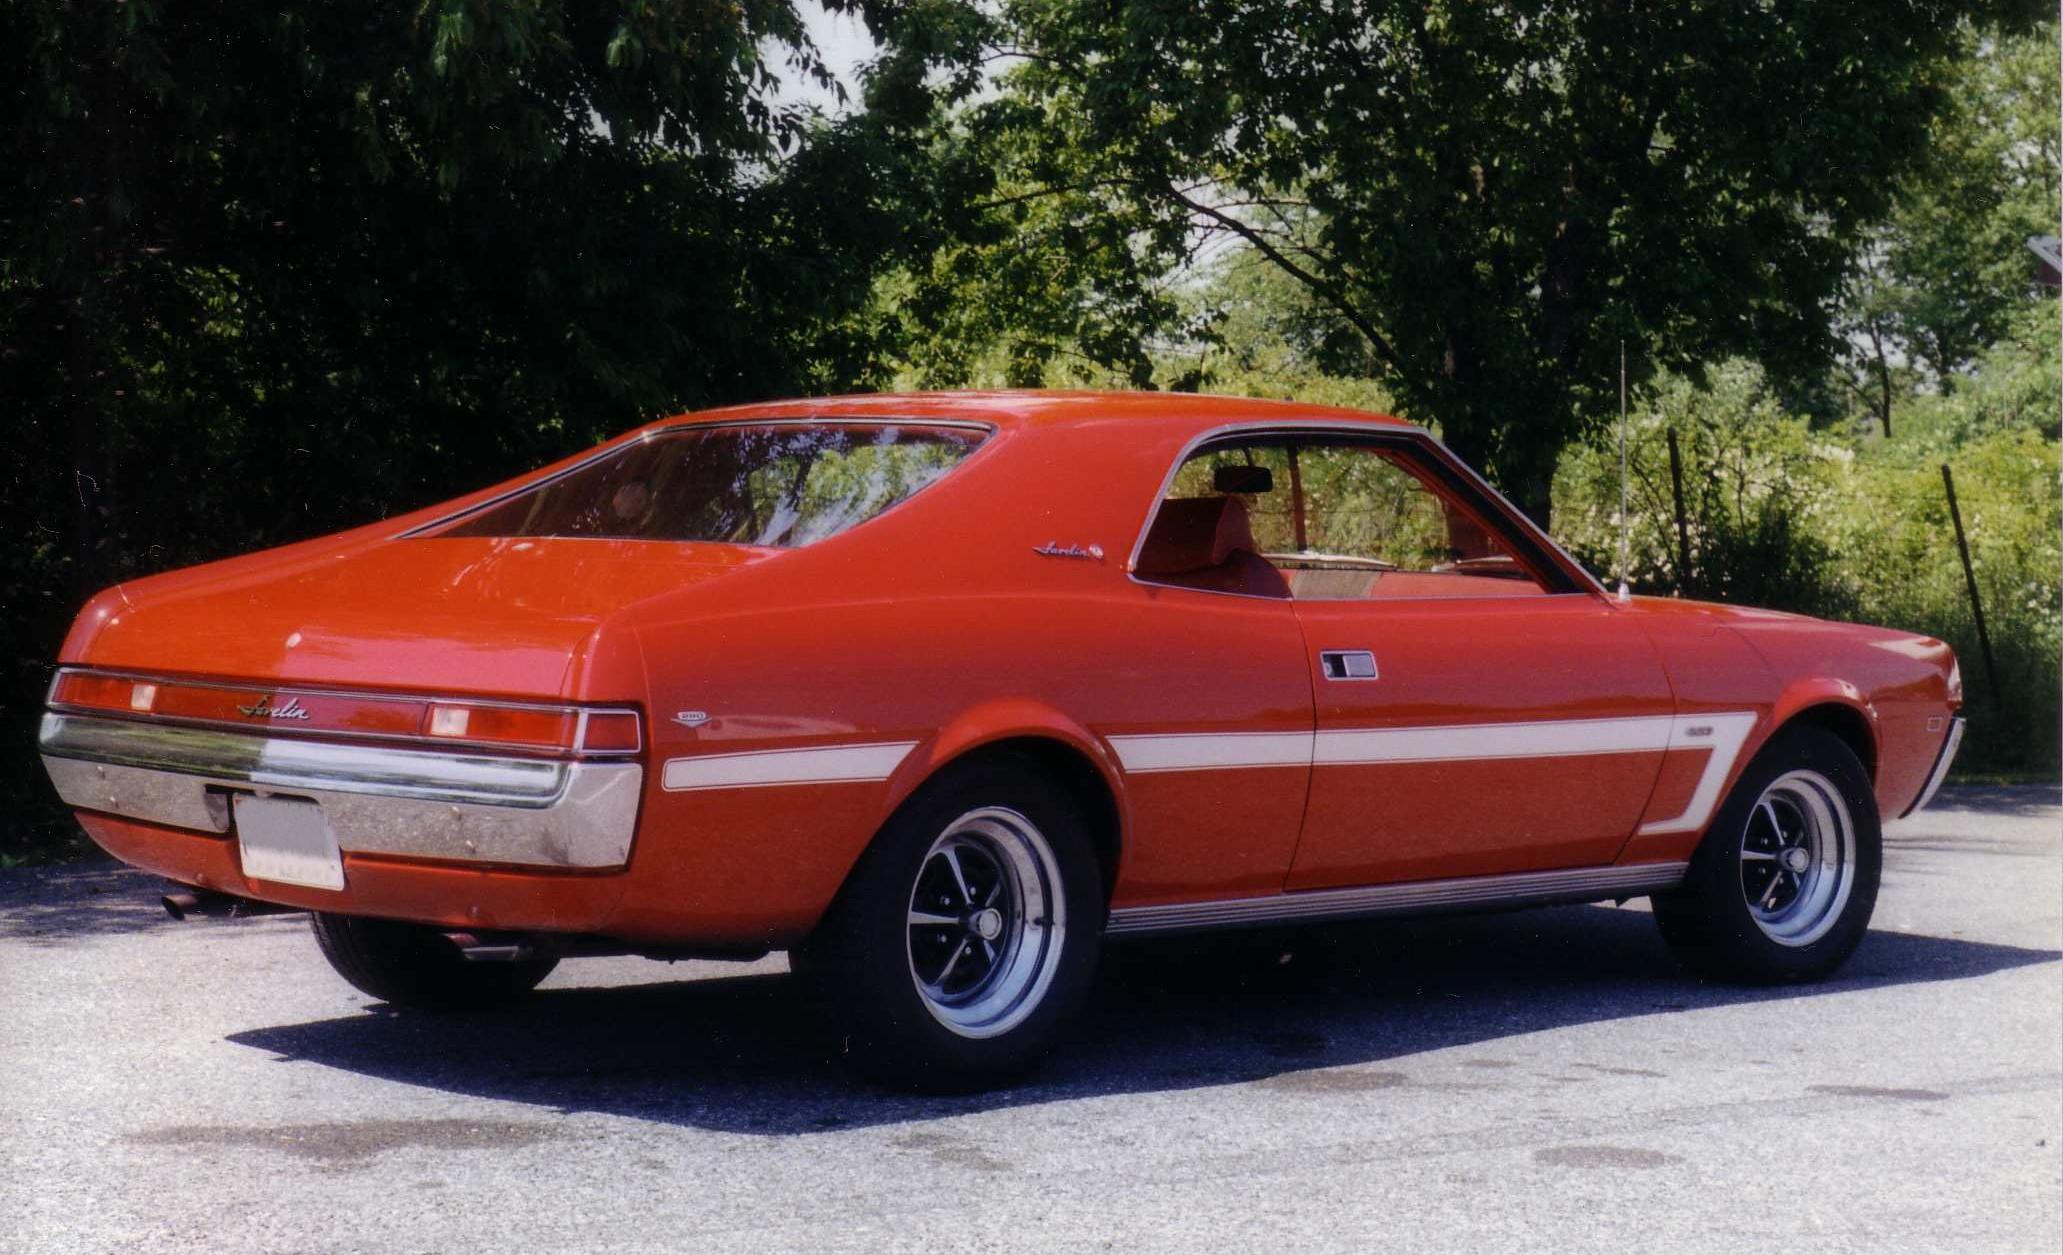 File 1969 Amc Javelin Sst Pony Car Red99 Jpg Wikimedia Commons